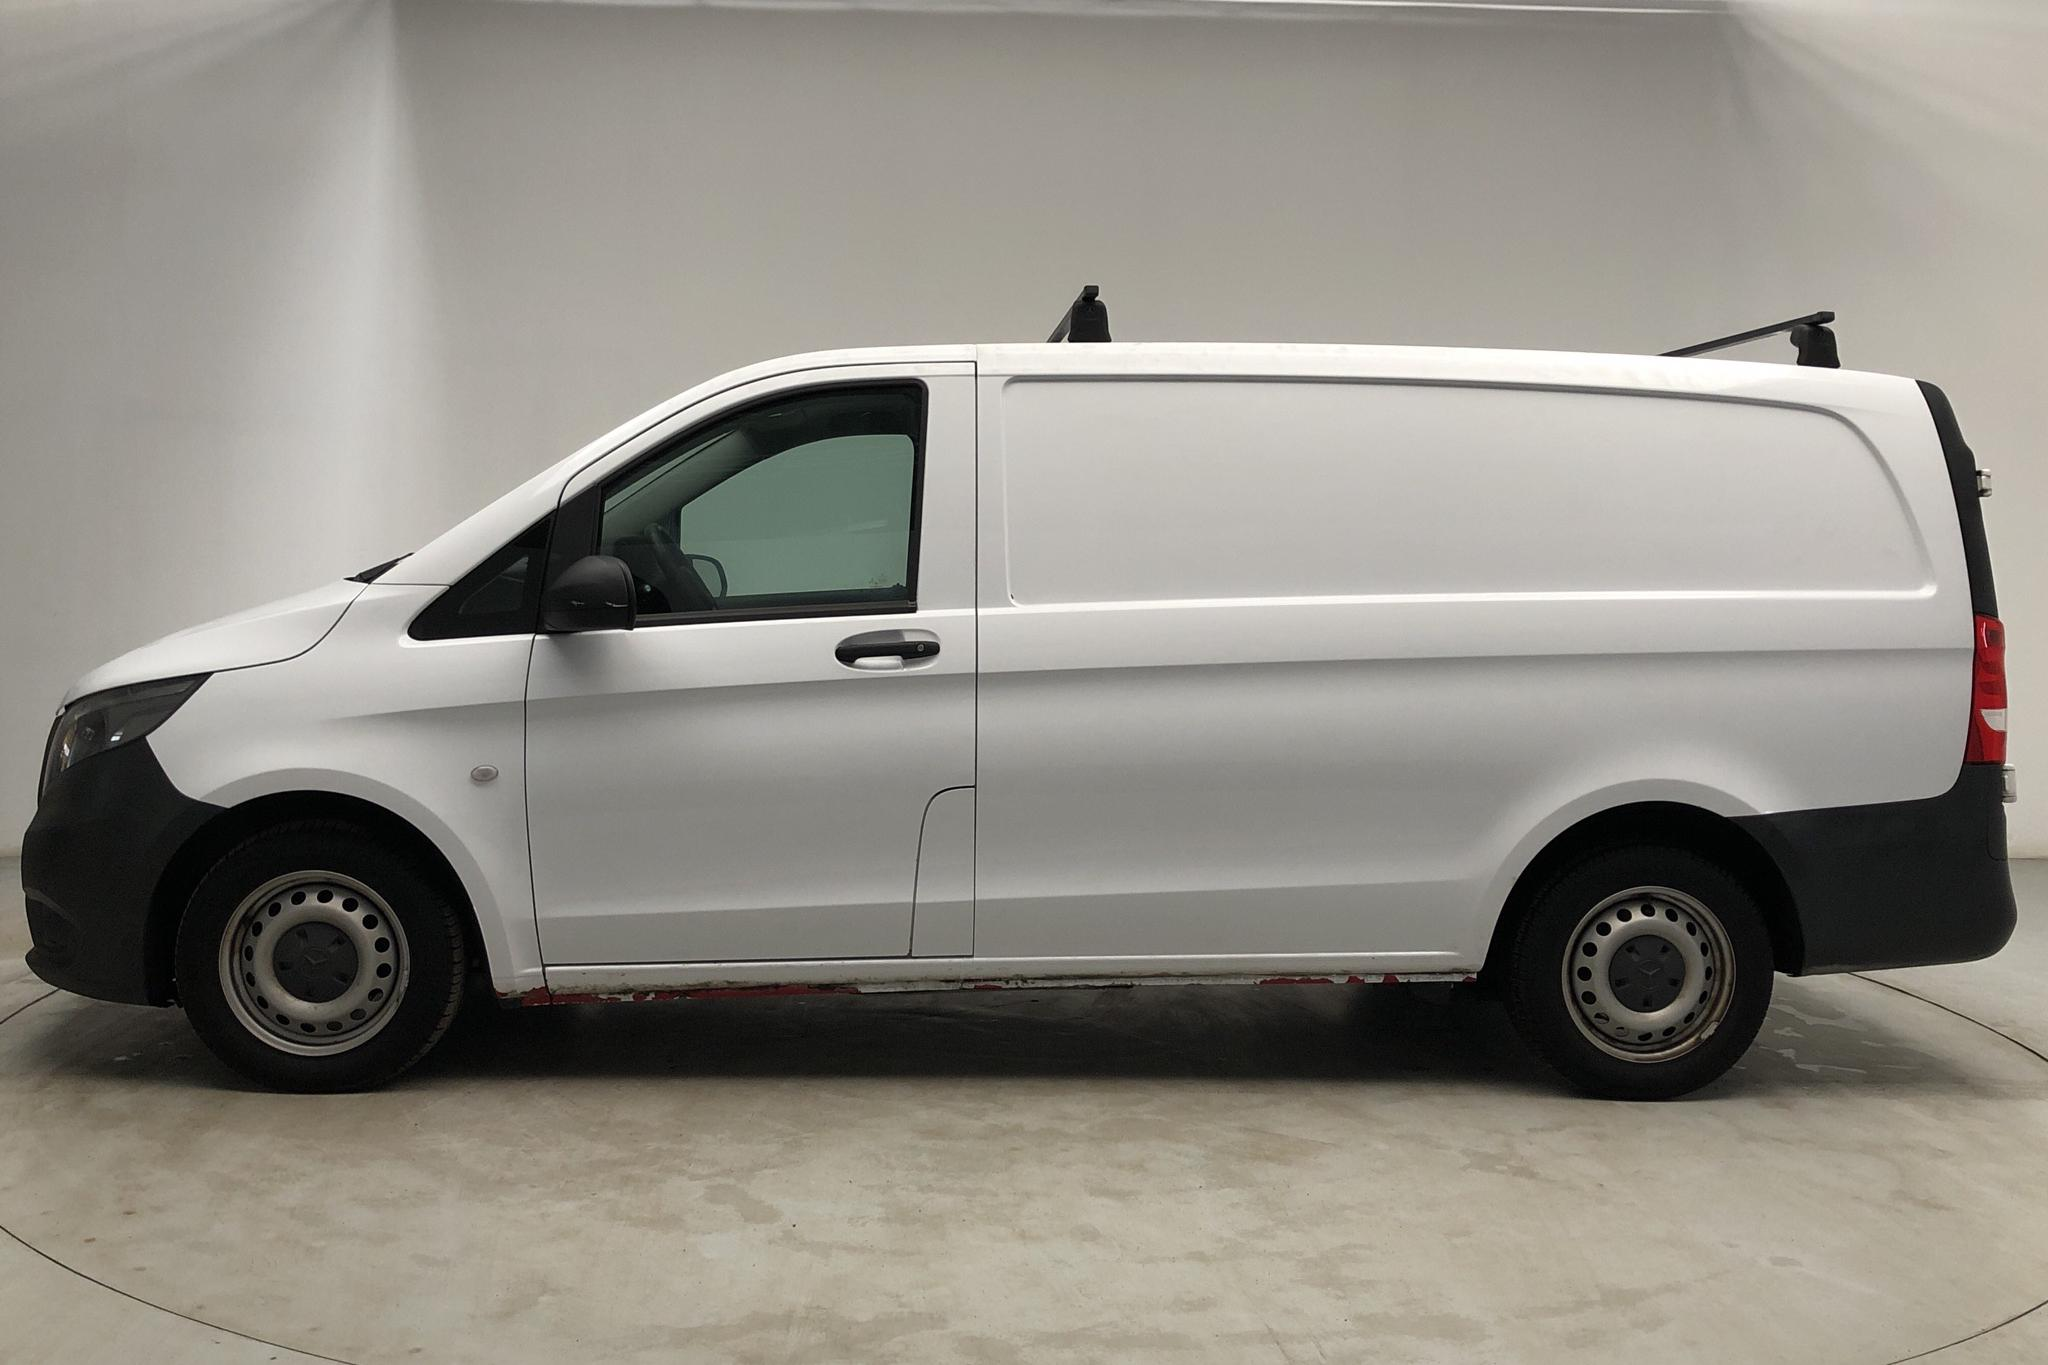 Mercedes Vito 109 CDI W640 (88hk) - 13 534 mil - Manuell - vit - 2015